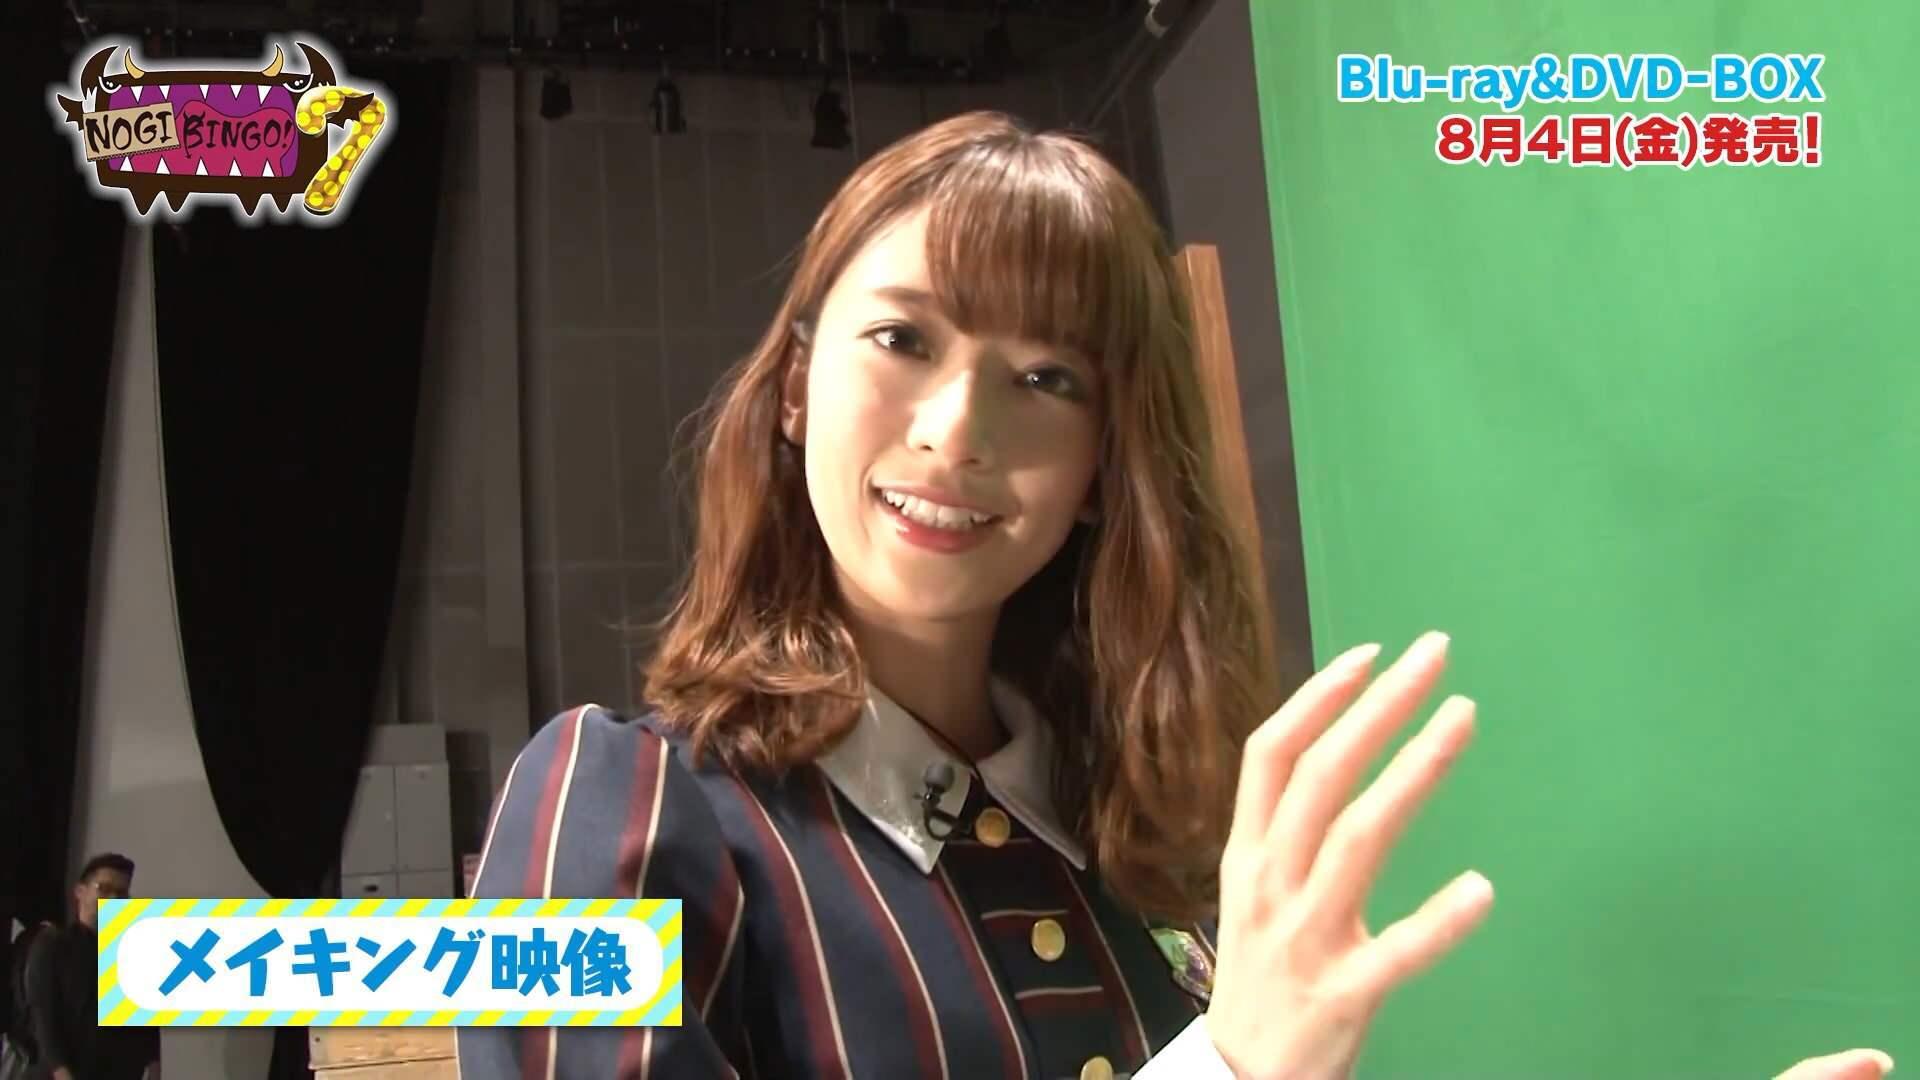 「NOGIBINGO!7」Blu-ray&DVD-BOX3